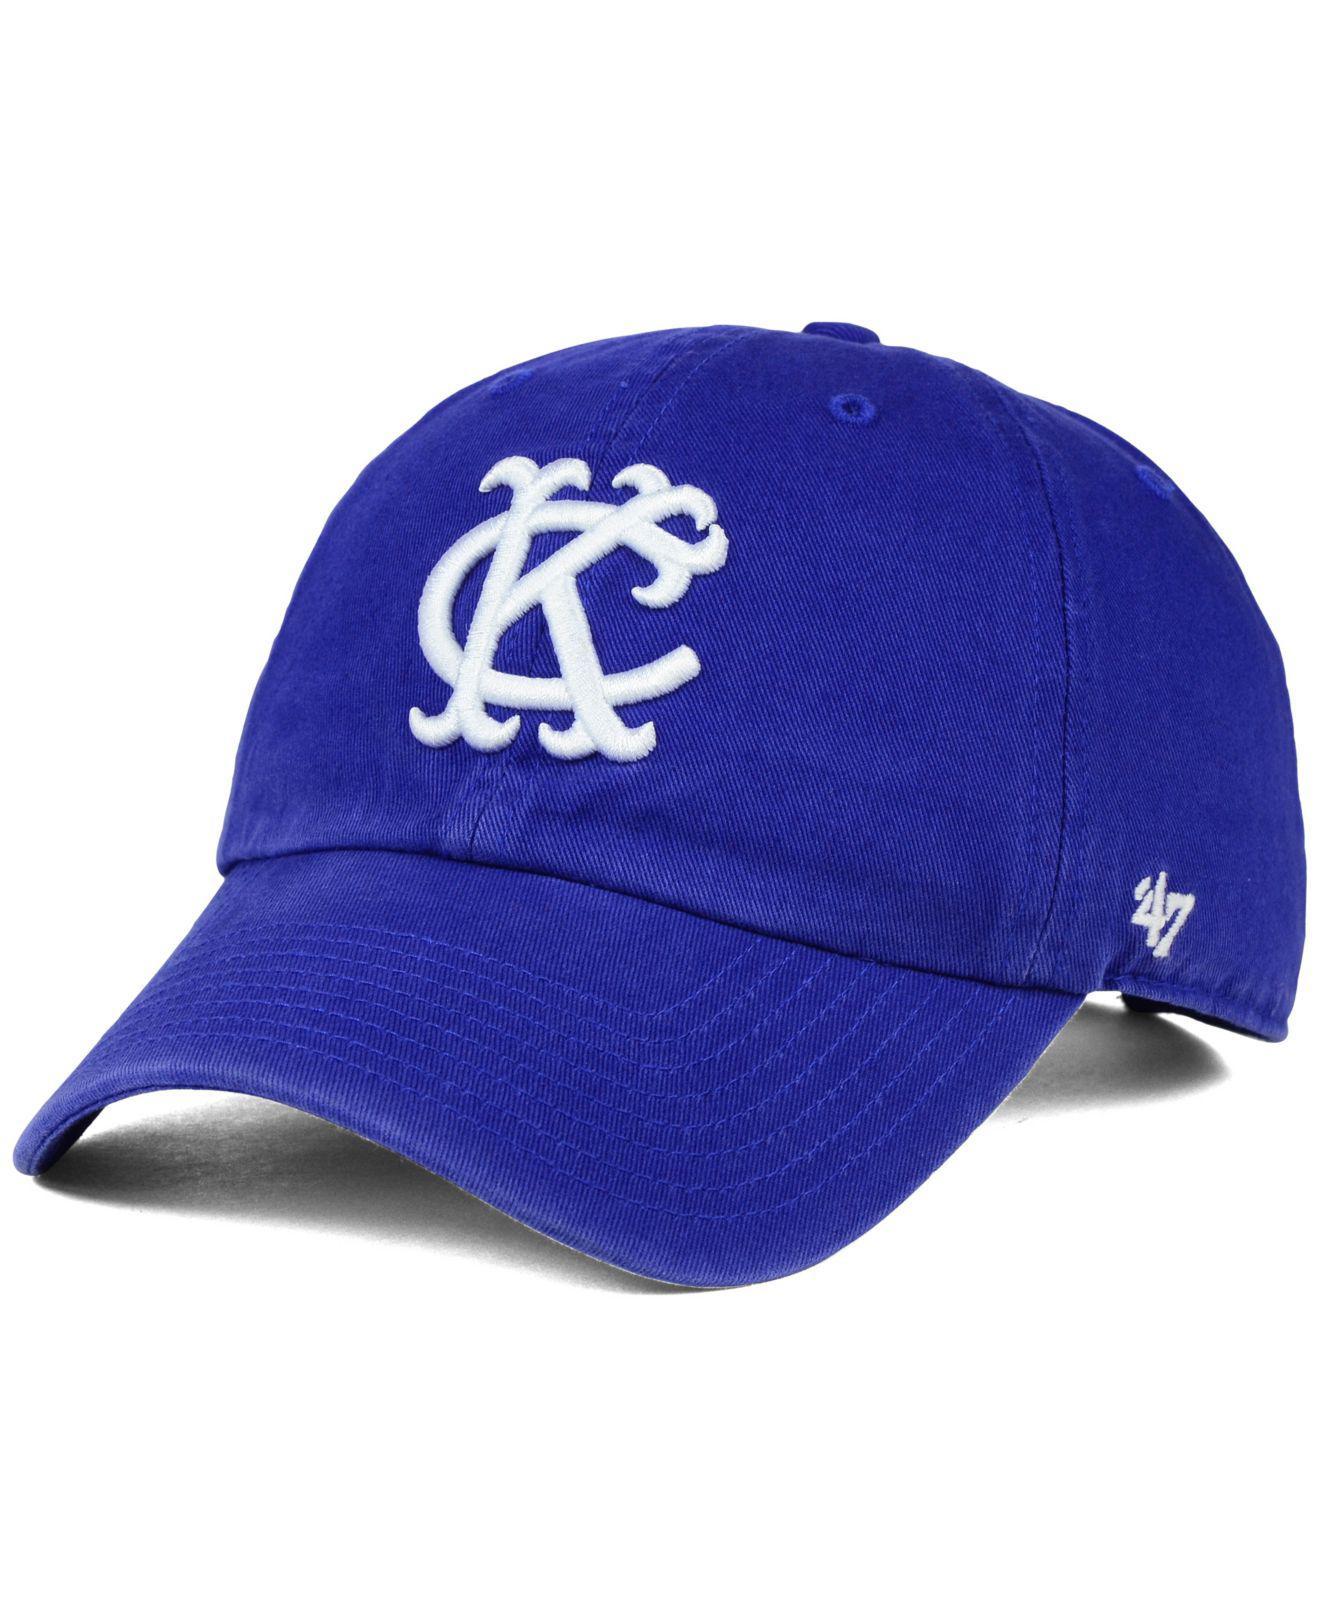 ffb12d68d04cb 47 Brand Kansas City Athletics Core Clean Up Cap in Blue for Men - Lyst